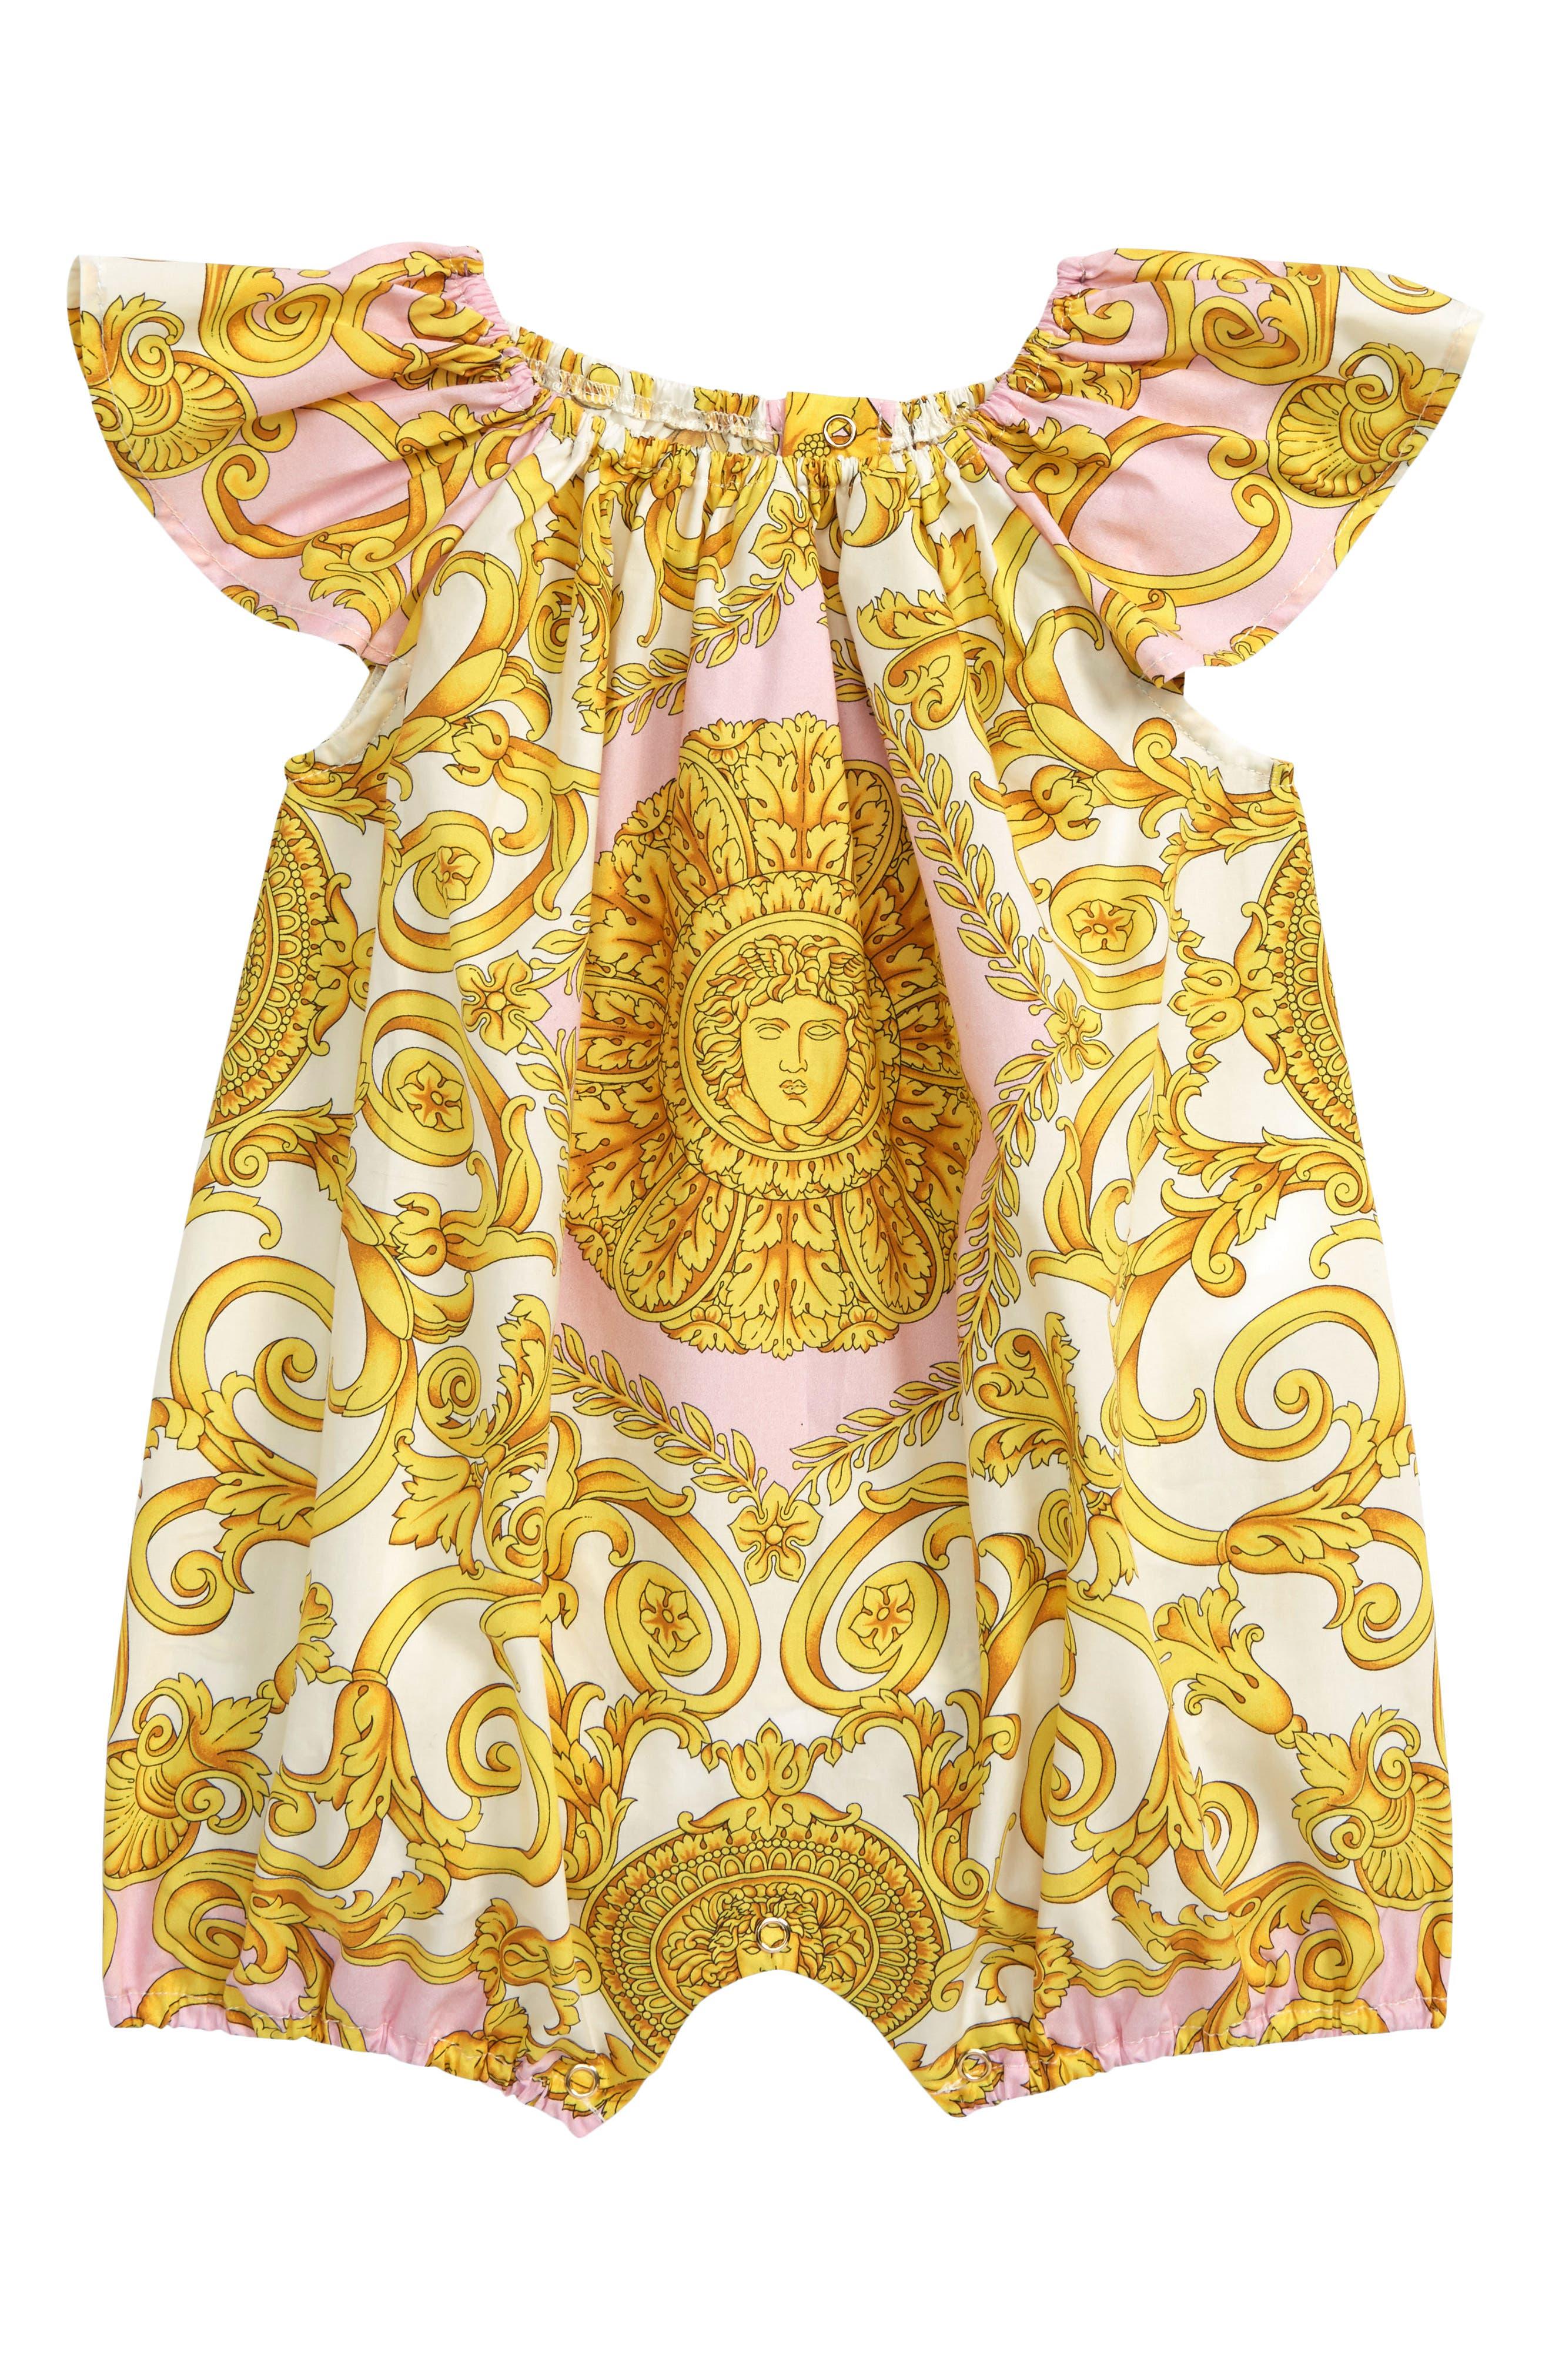 VERSACE Barocco Print Romper, Main, color, PINK/GOLD